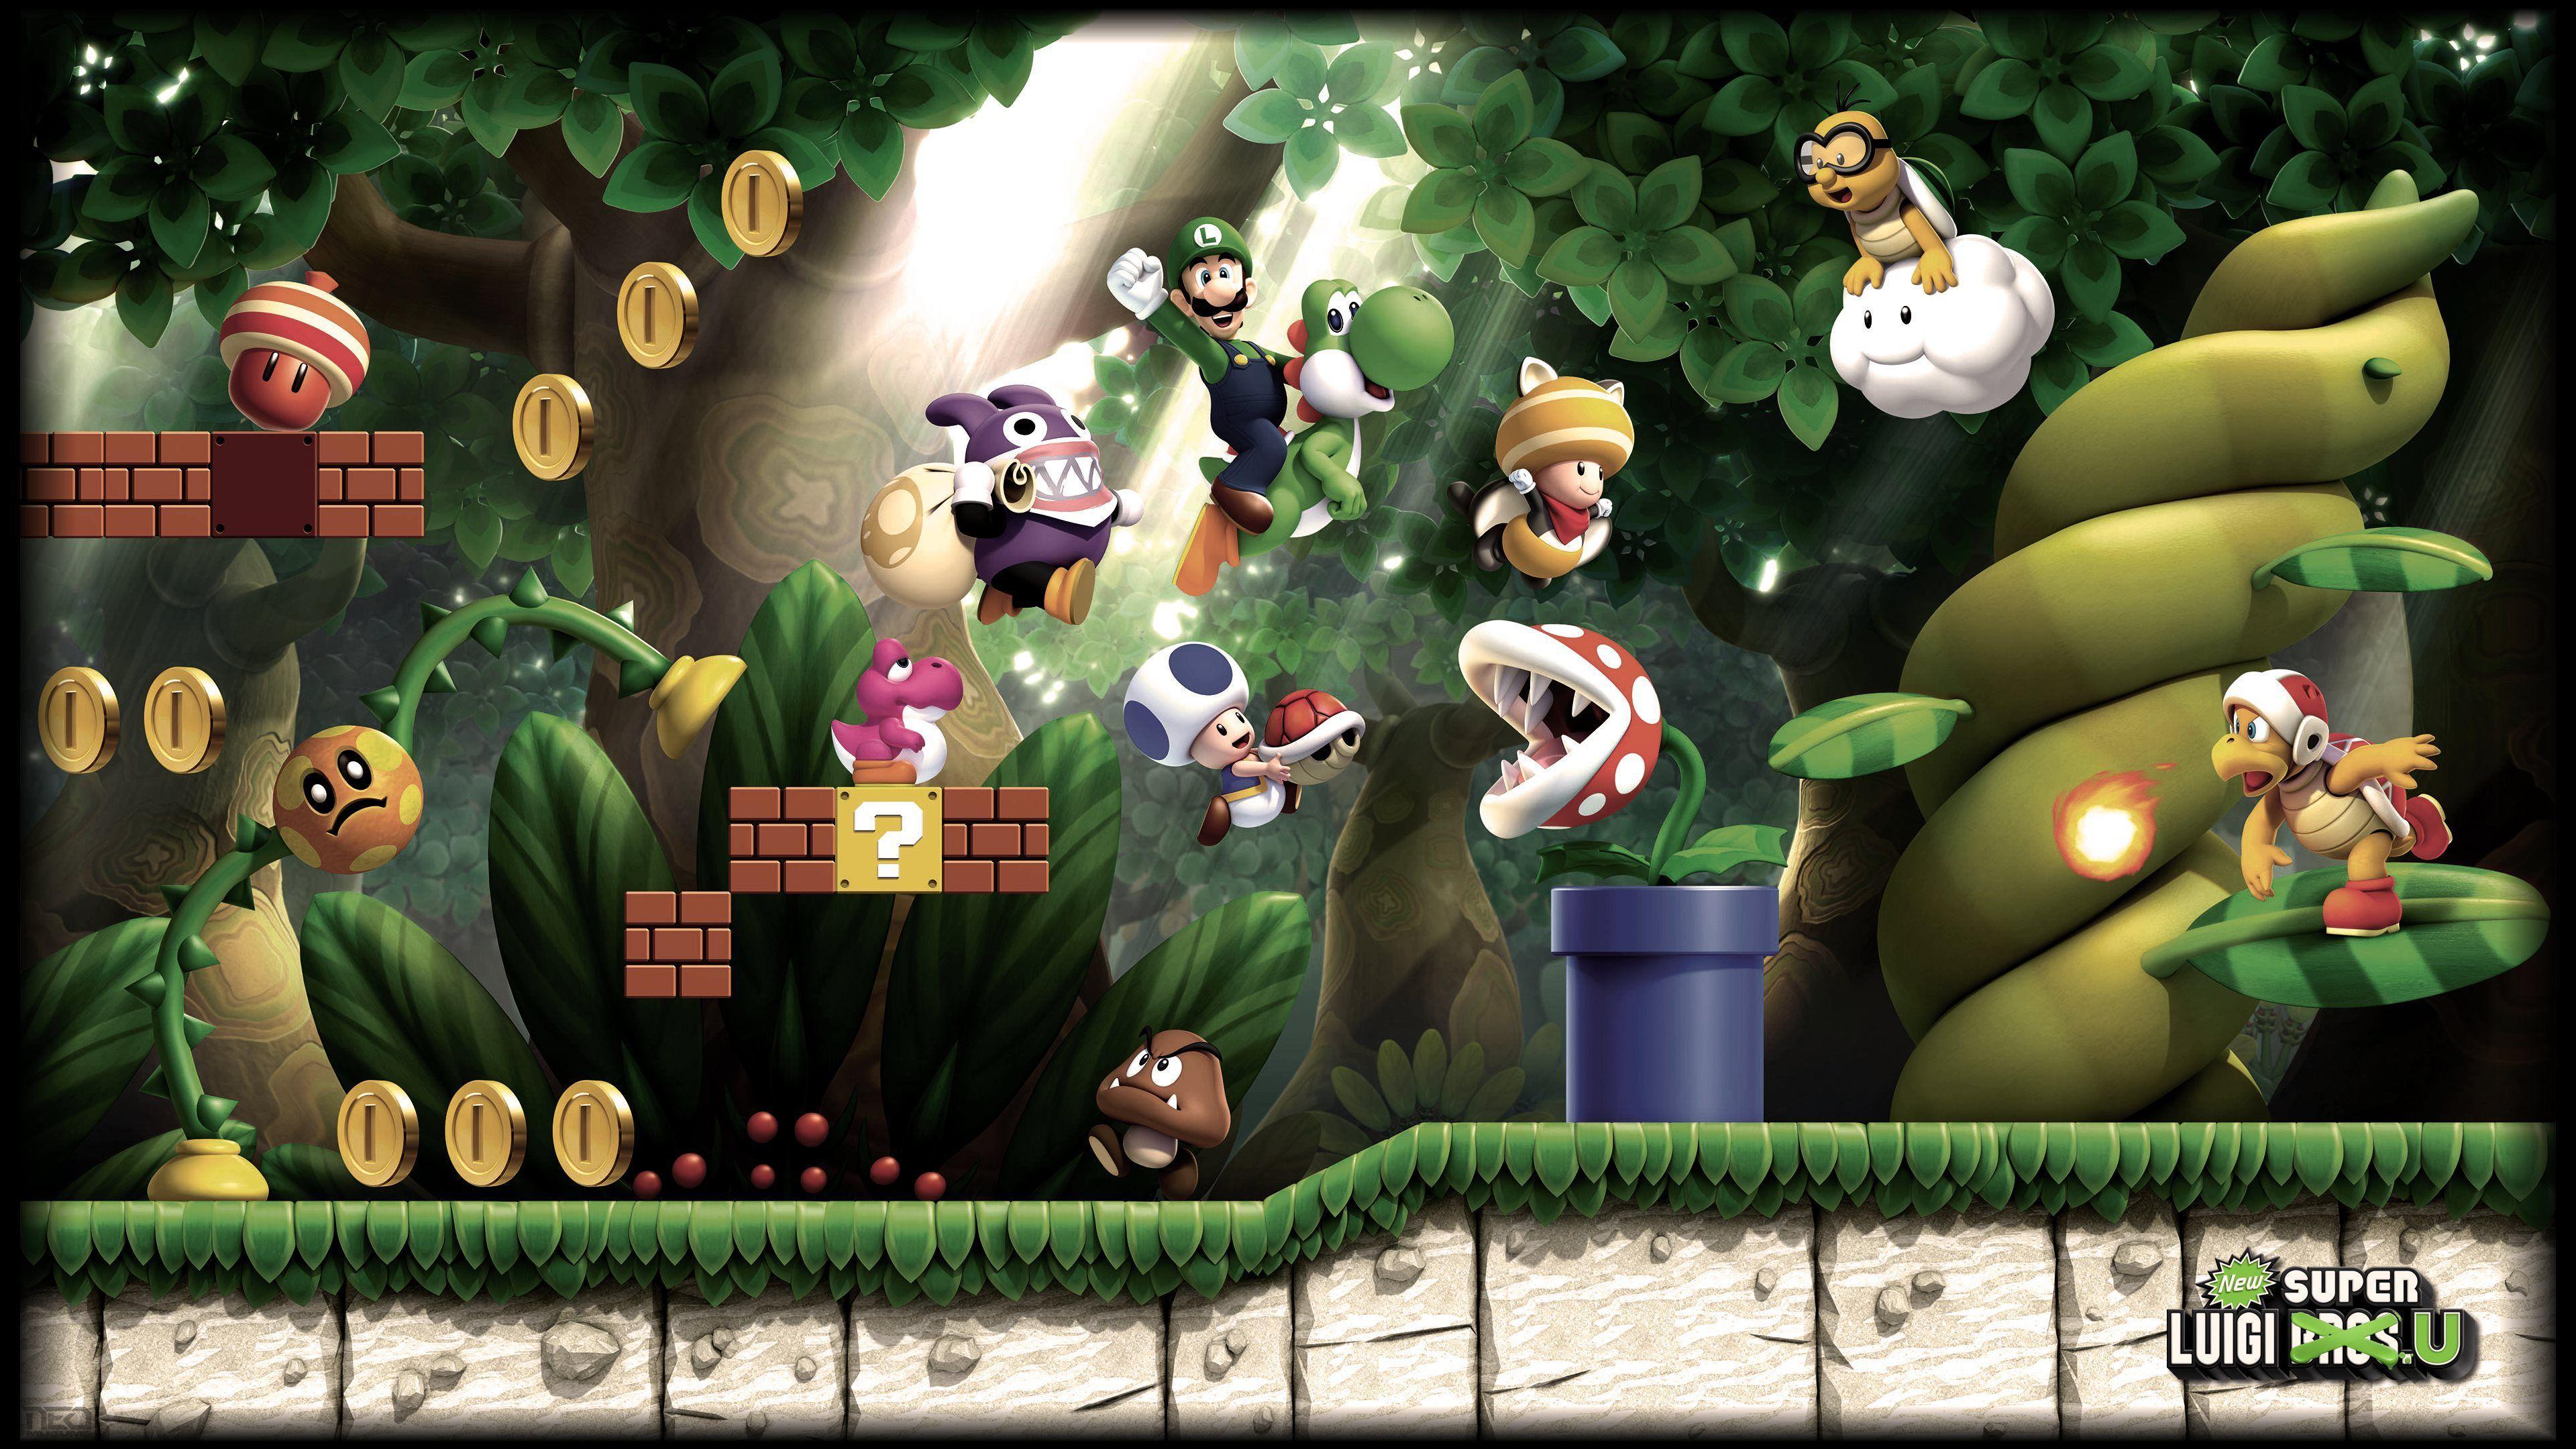 4k Mario Wallpapers Top Free 4k Mario Backgrounds